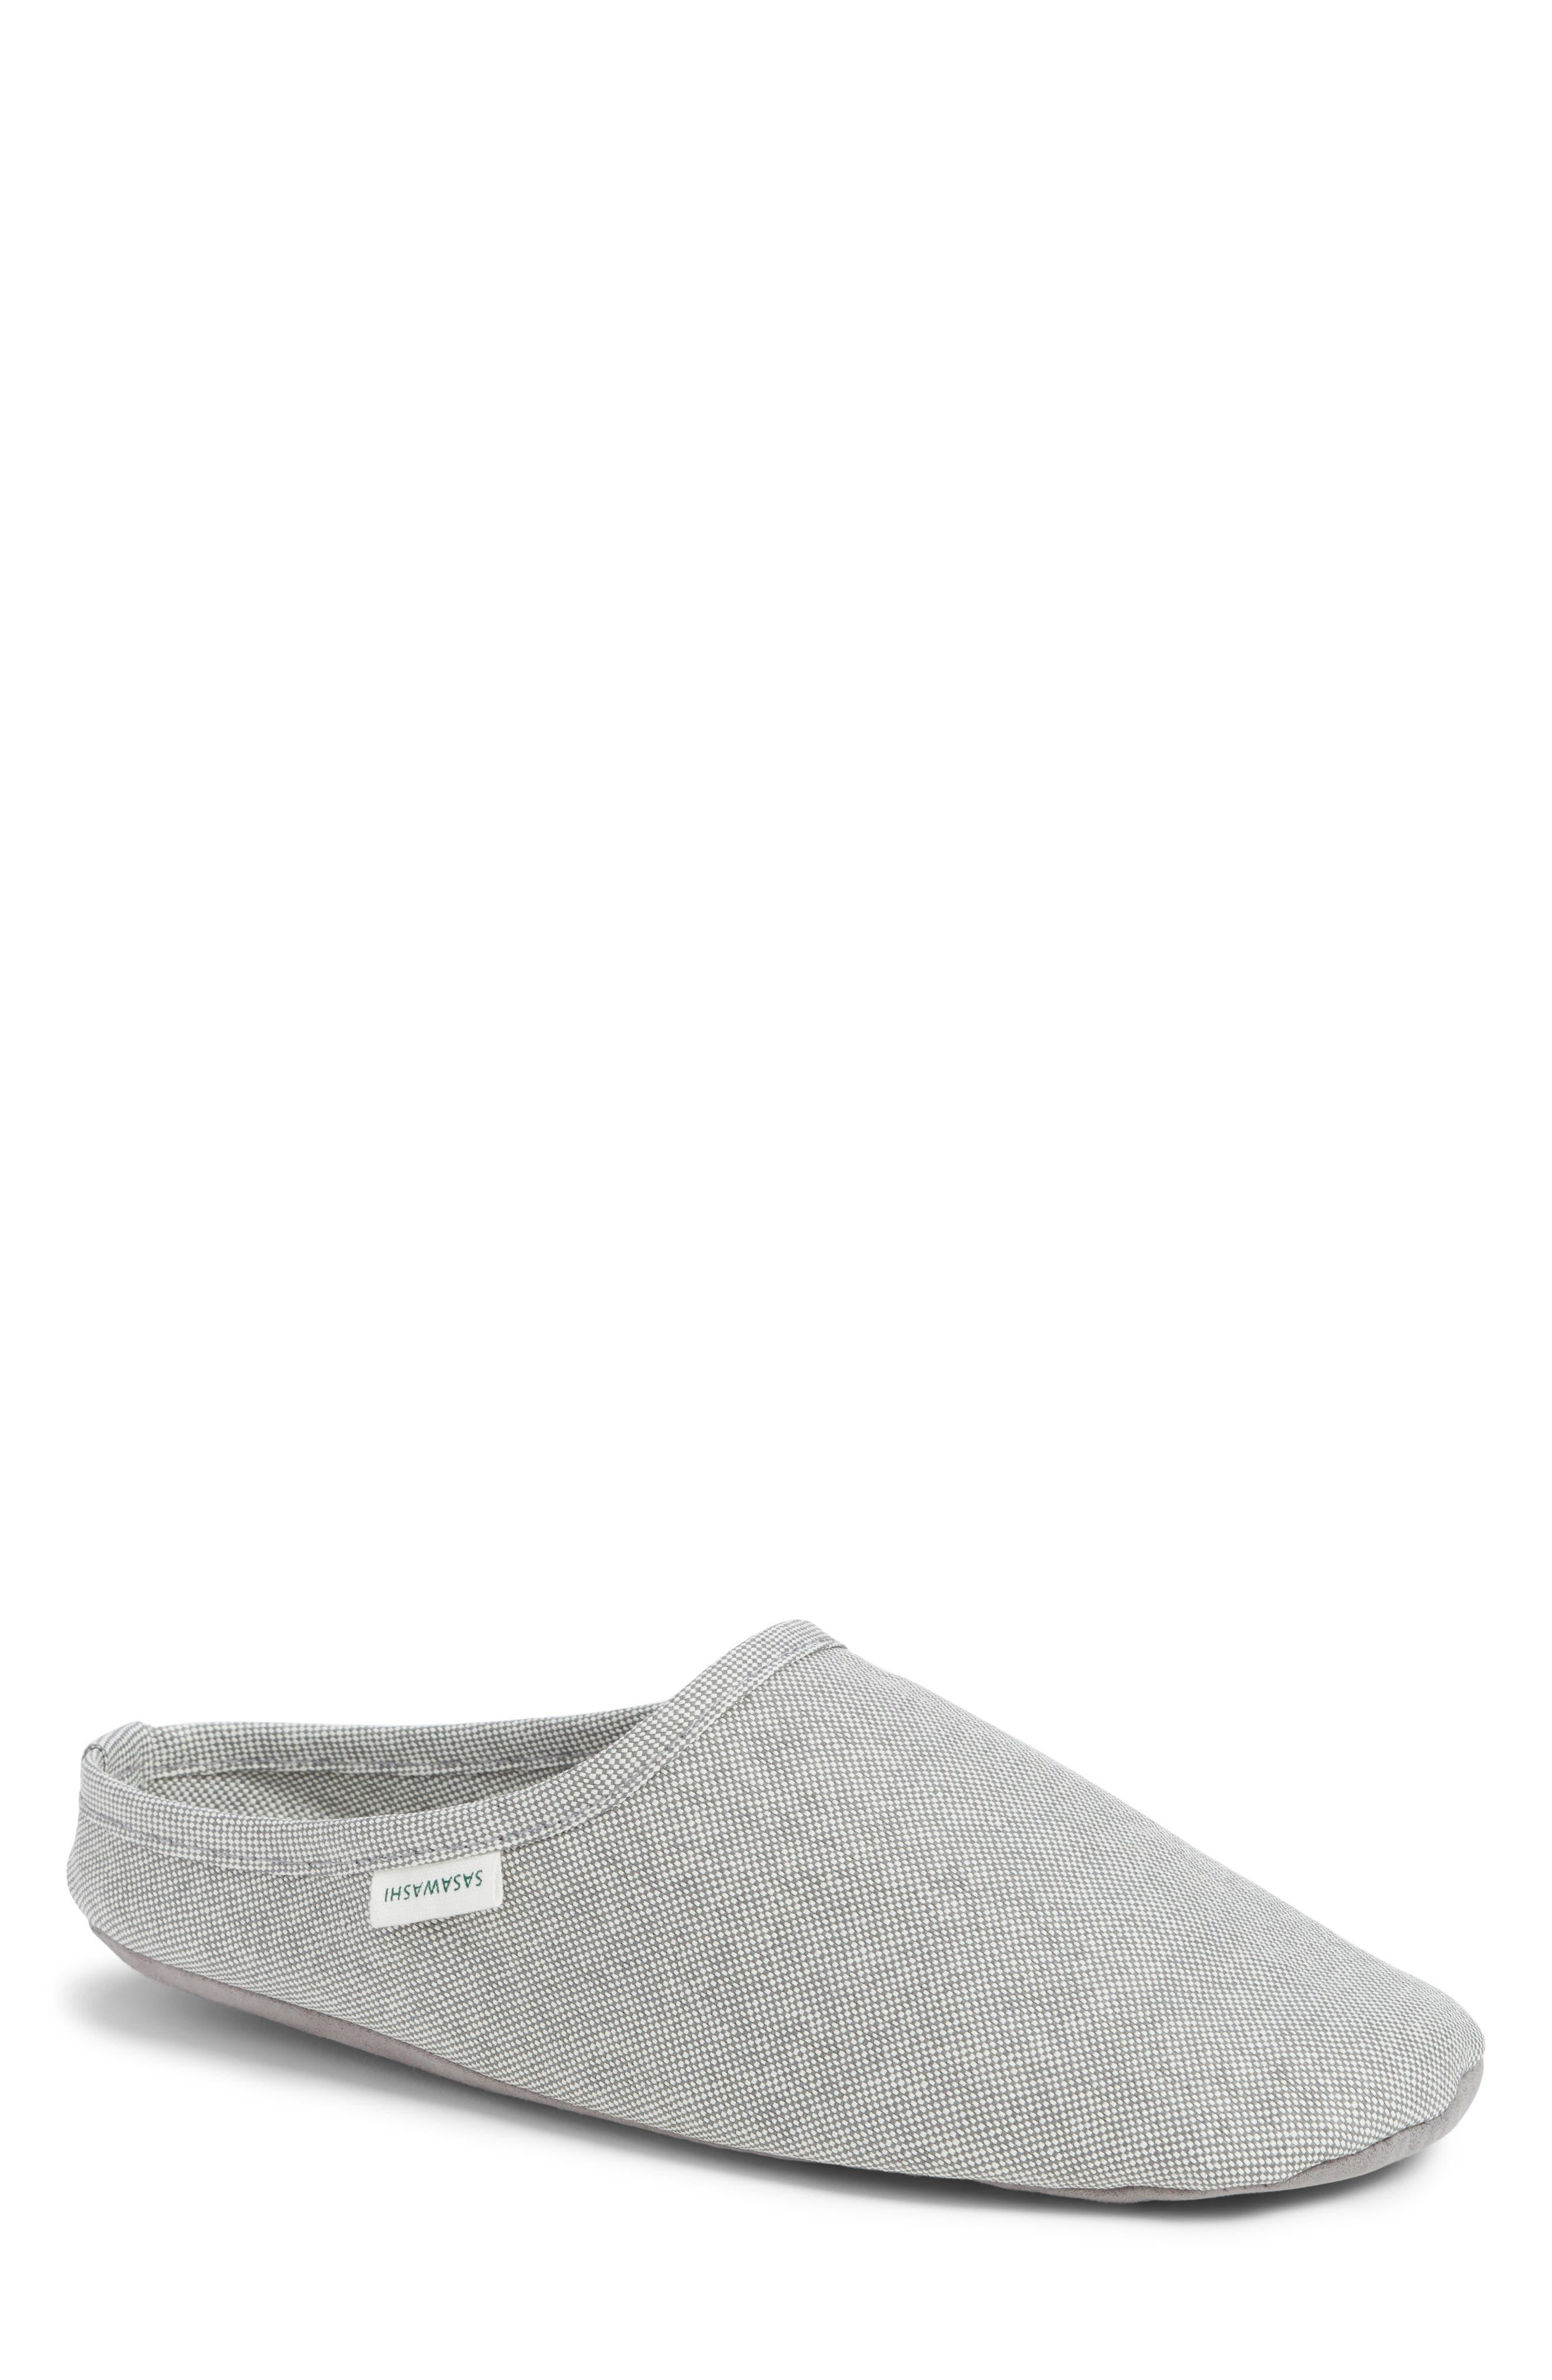 MORIHATA Sasawashi Room Shoe in Grey